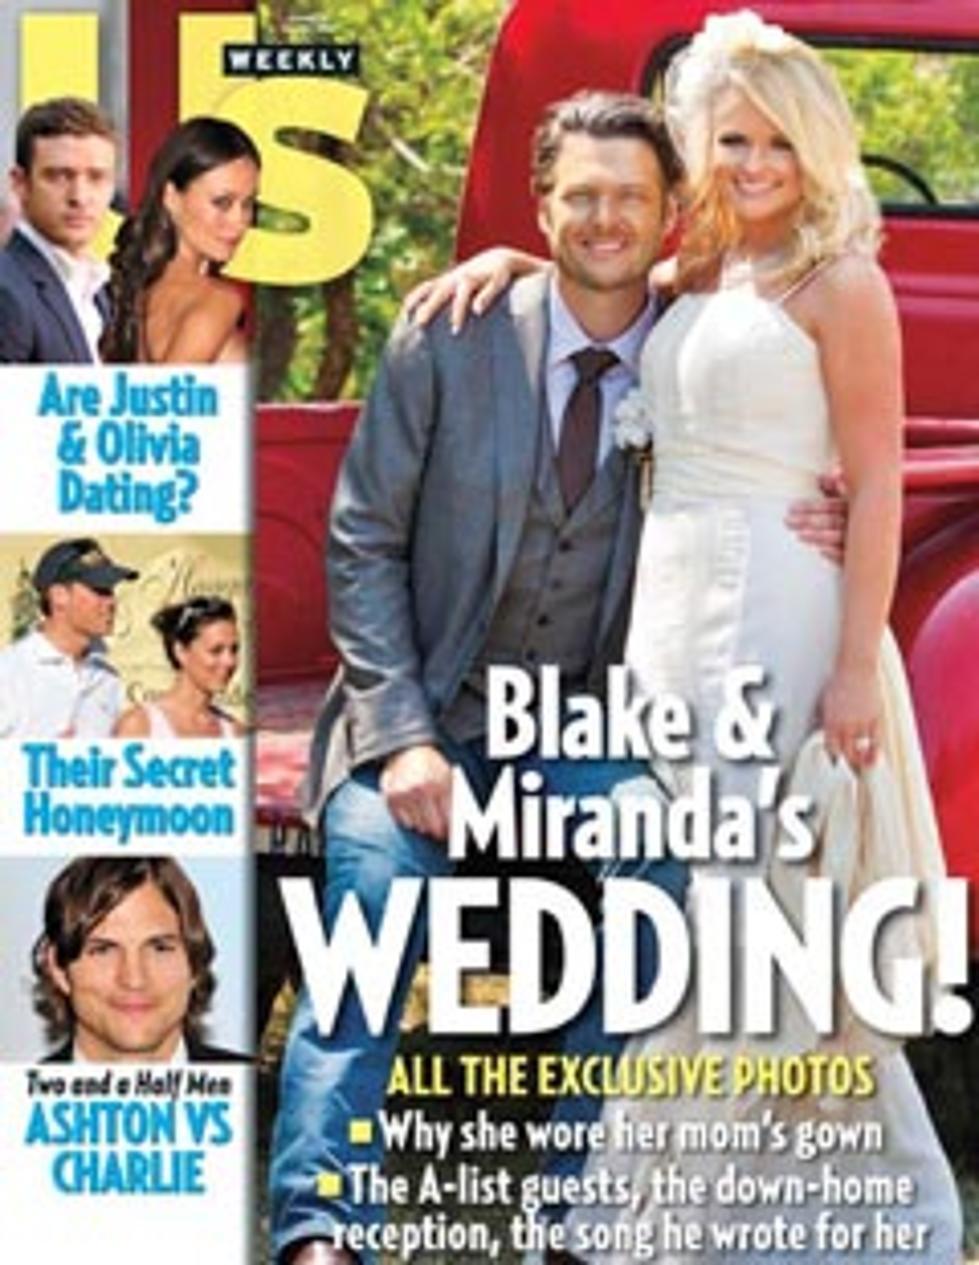 Blake Shelton And Miranda Lambert Wedding.Blake Shelton Miranda Lambert Fill Wedding With Music